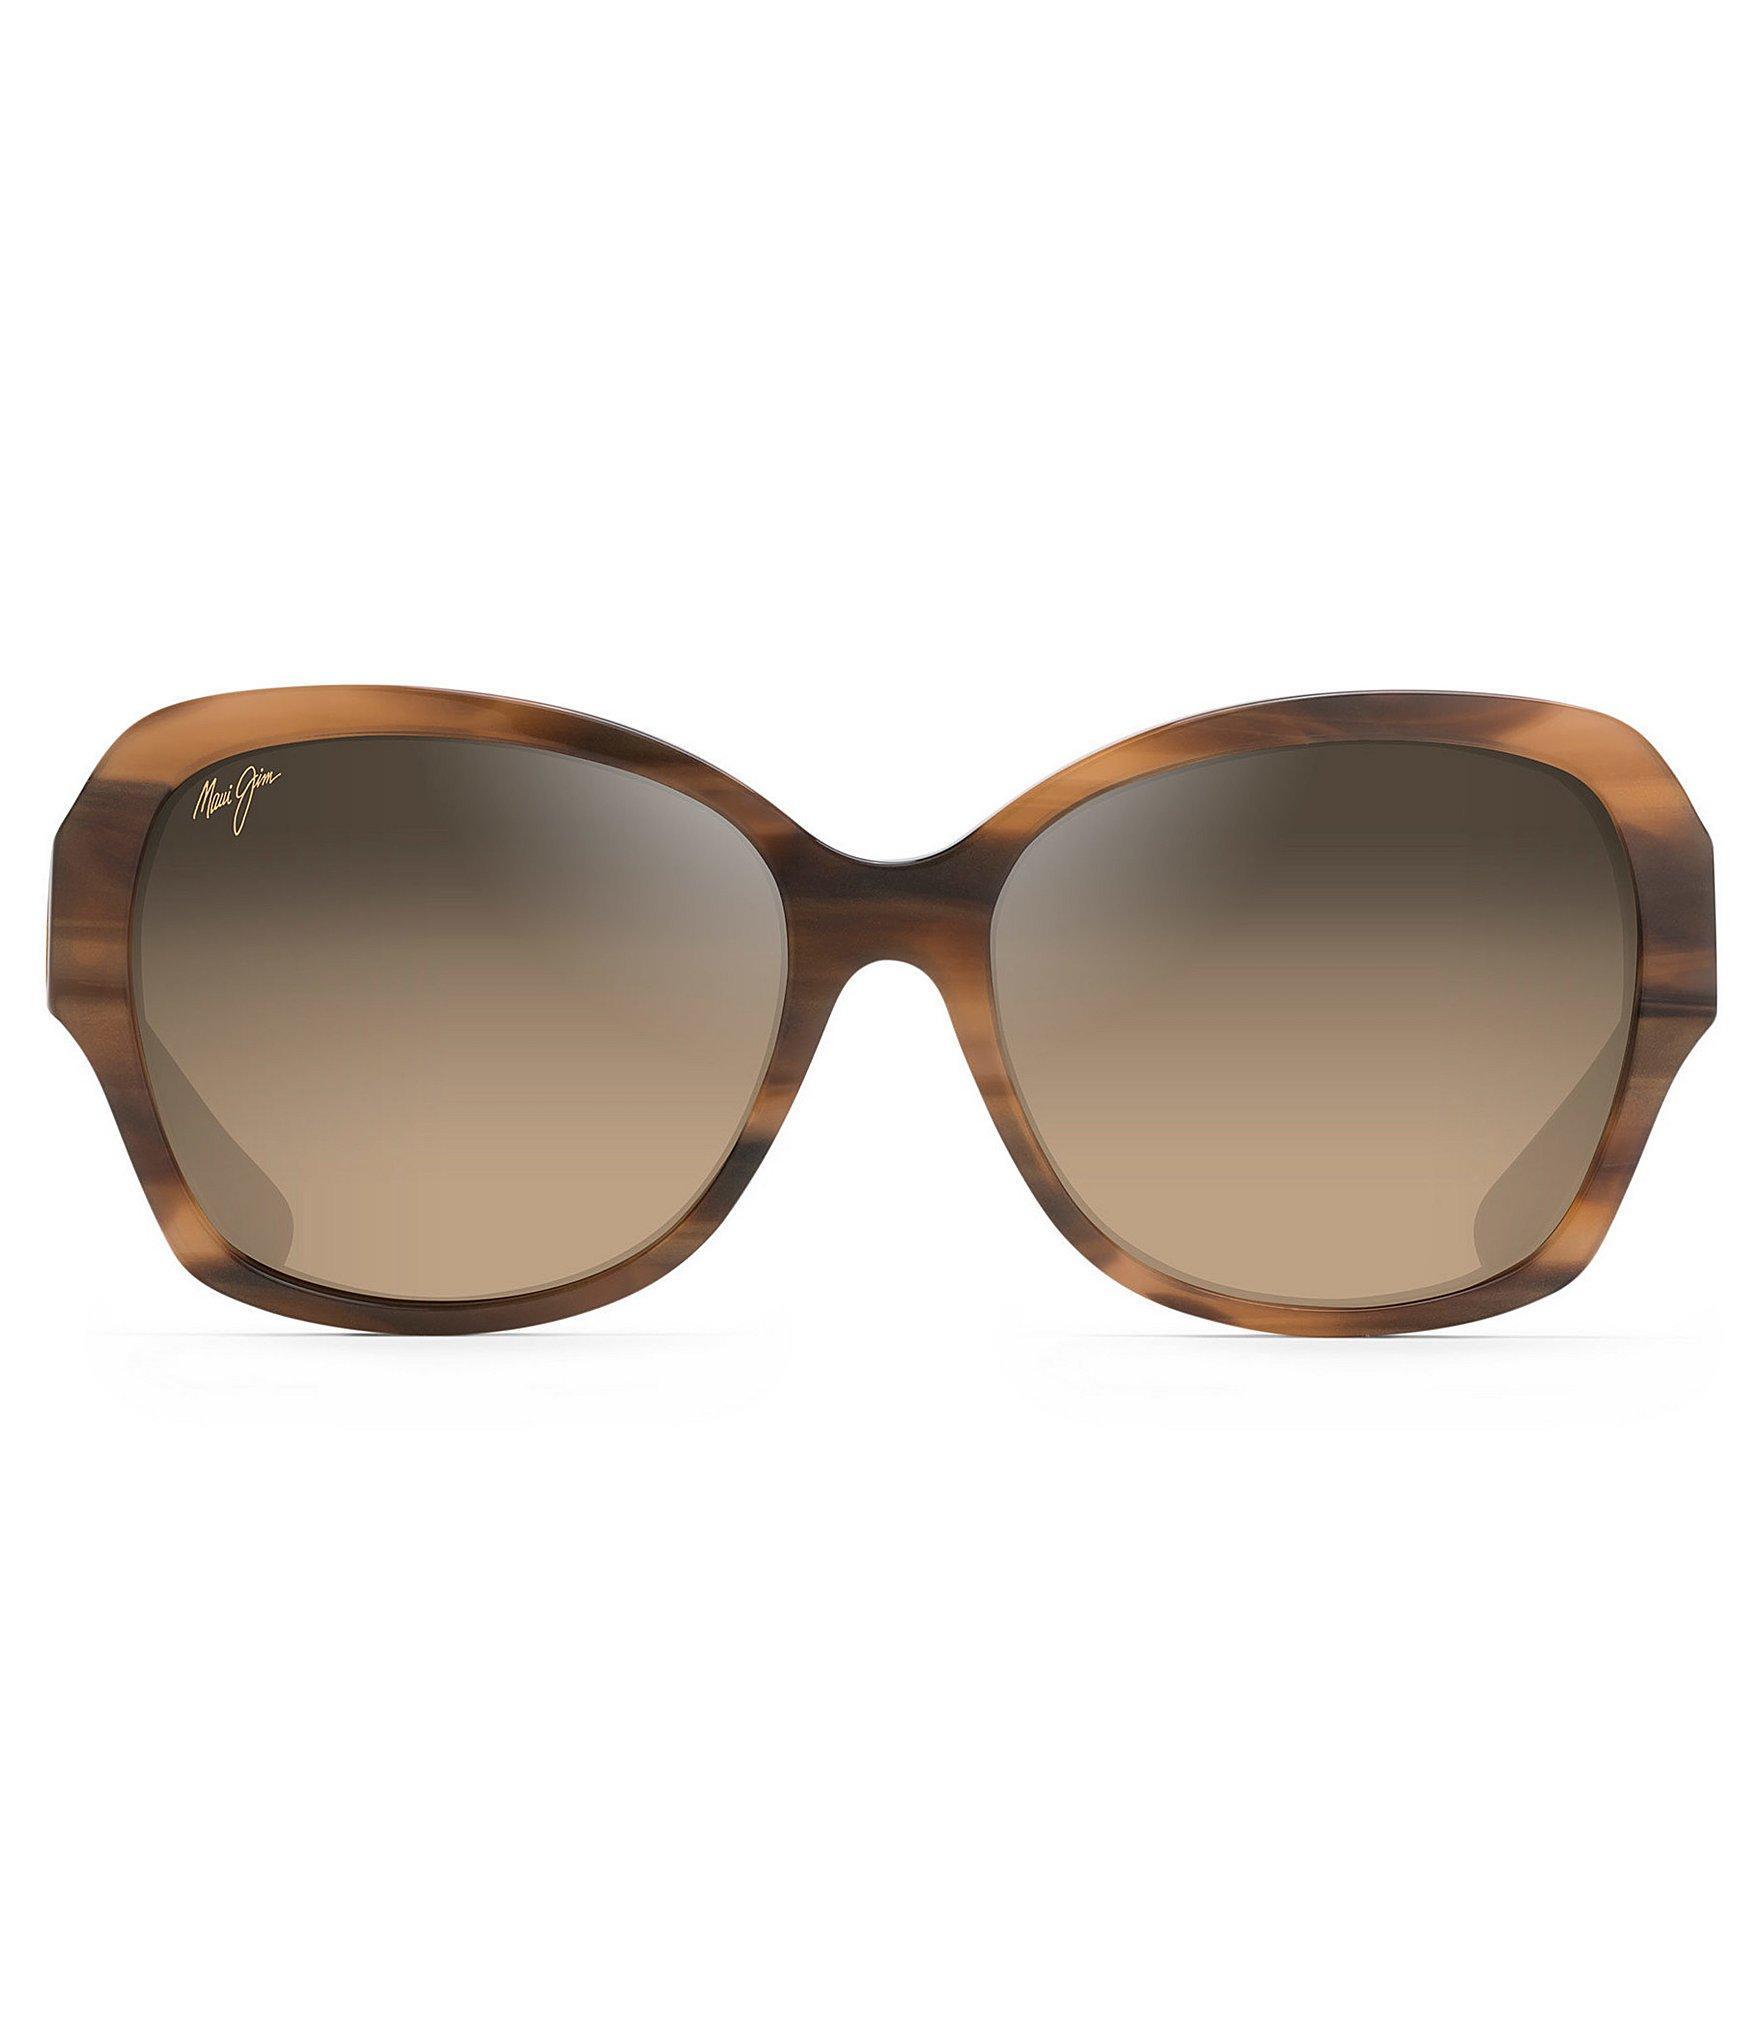 bf9cbfaf9ac1 Maui Jim - Brown Swaying Palms Polarized Fashion Sunglasses - Lyst. View  fullscreen